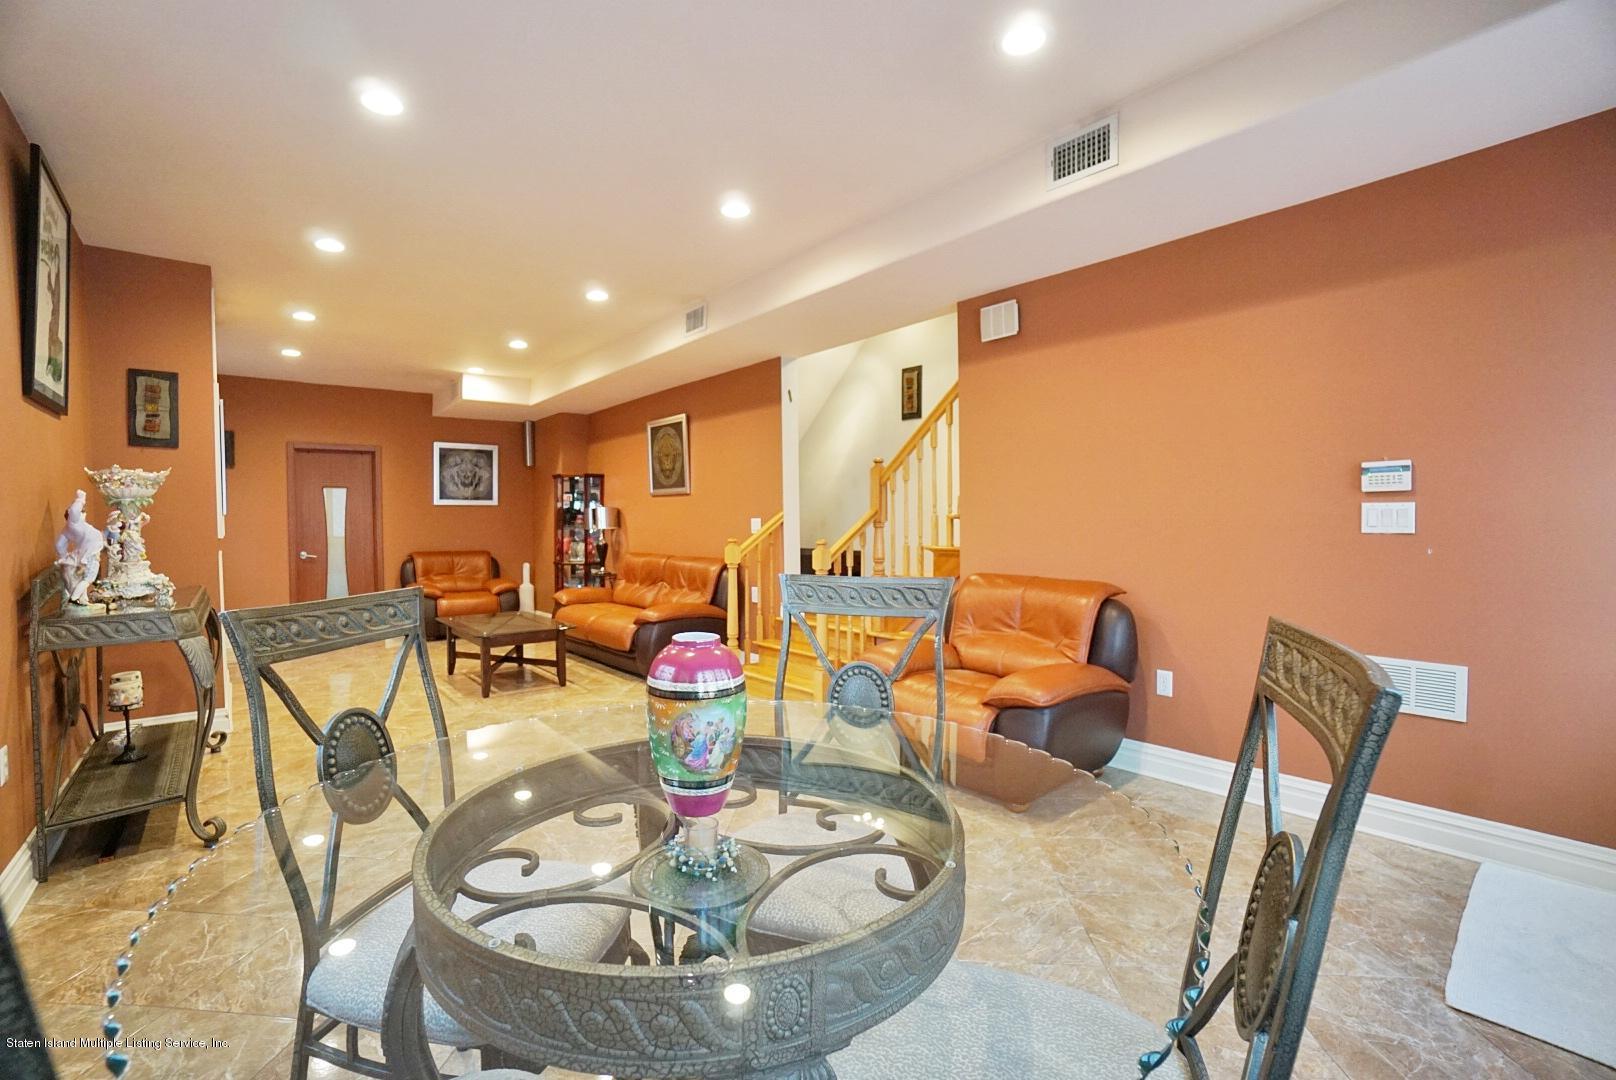 Single Family - Detached 48 Ocean Terrace  Staten Island, NY 10314, MLS-1130826-33